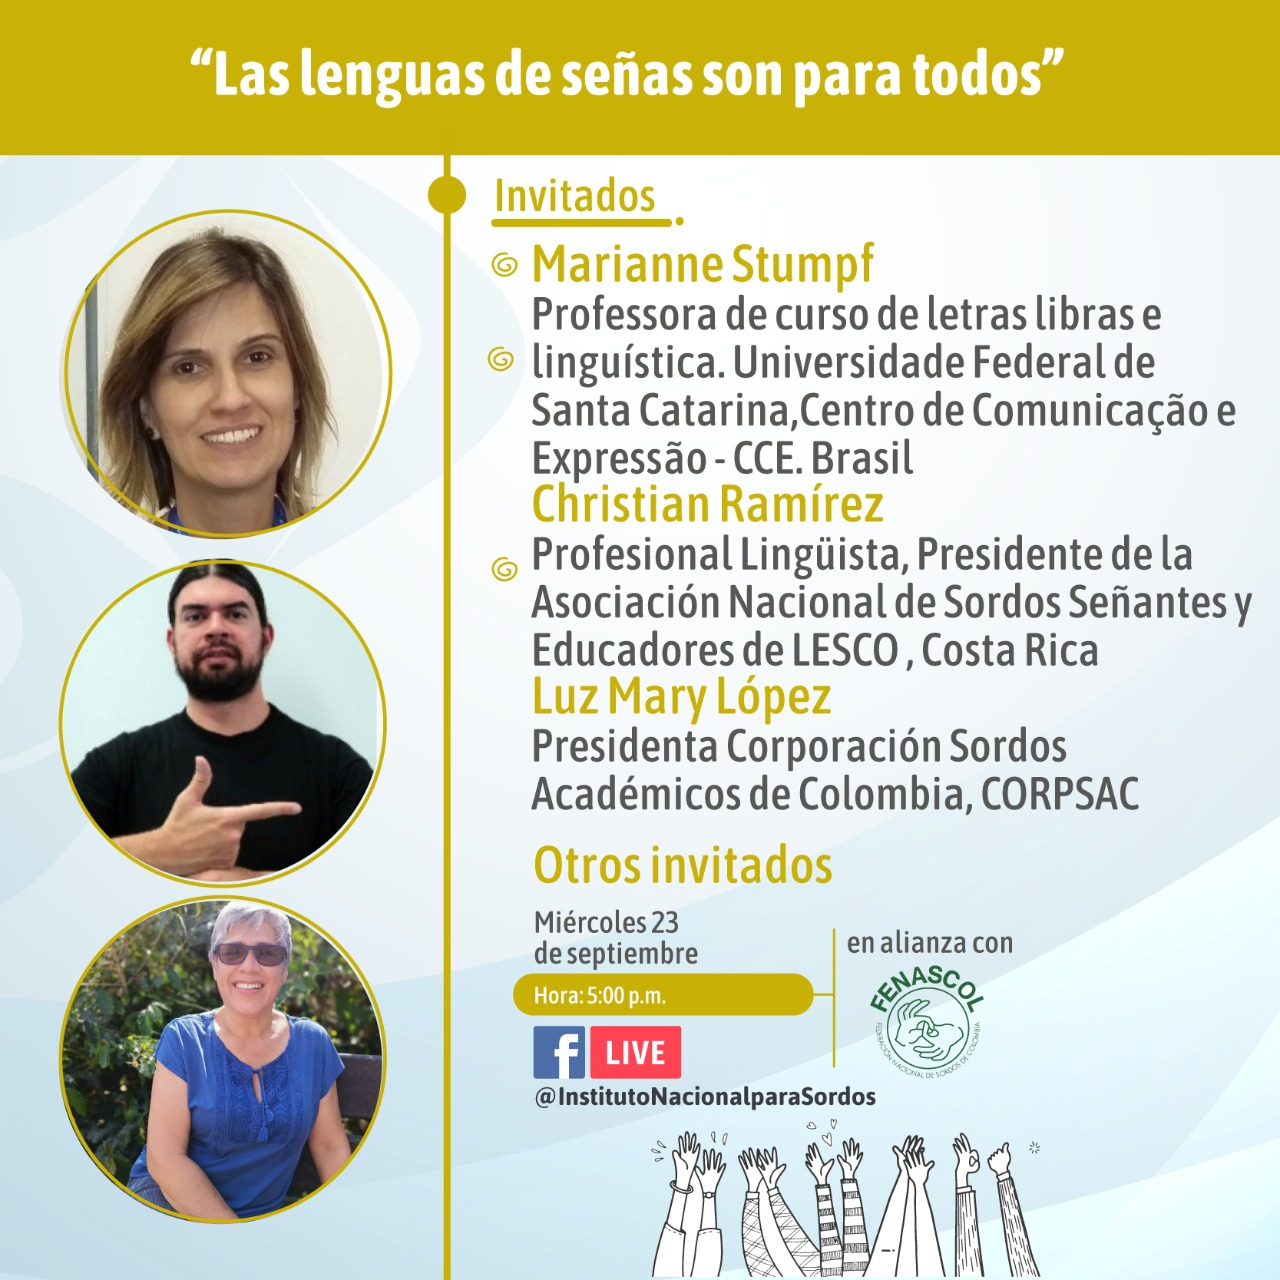 "Las lenguas de señas son para todos"" con fotos de participantes – Marianne Stumpf - Universidade Federal de Santa Catarina, Brasil; Christian Ramírez, Costa Rica y Luz Mary López, Colombia."